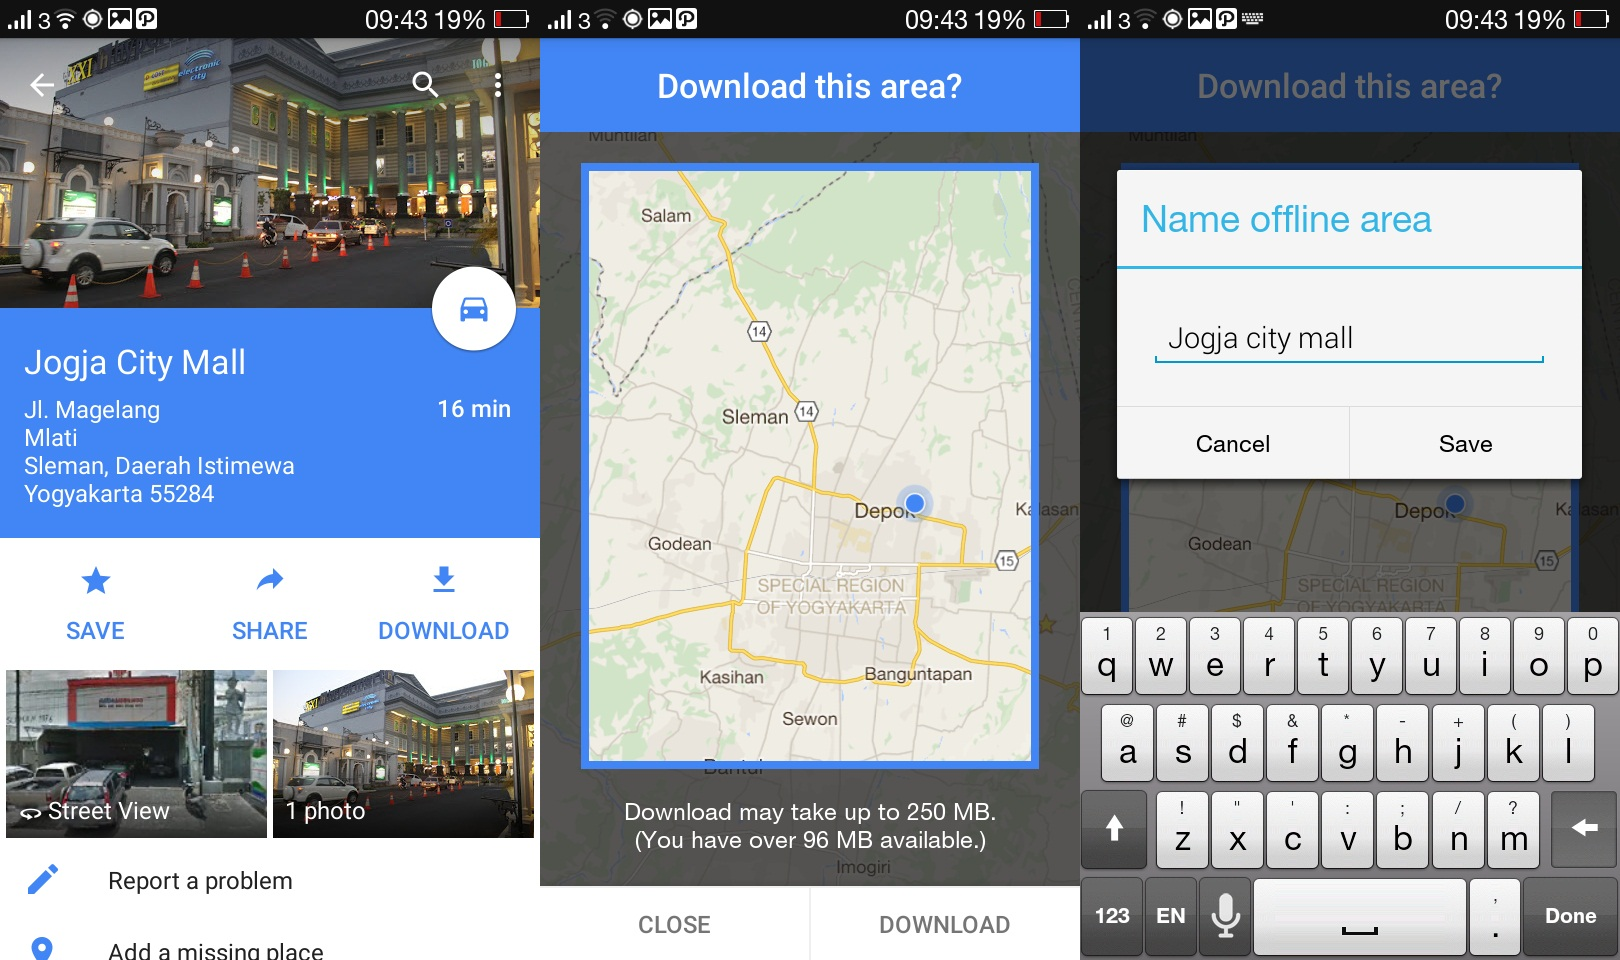 5 Langkah menggunakan Google Maps tanpa koneksi internet